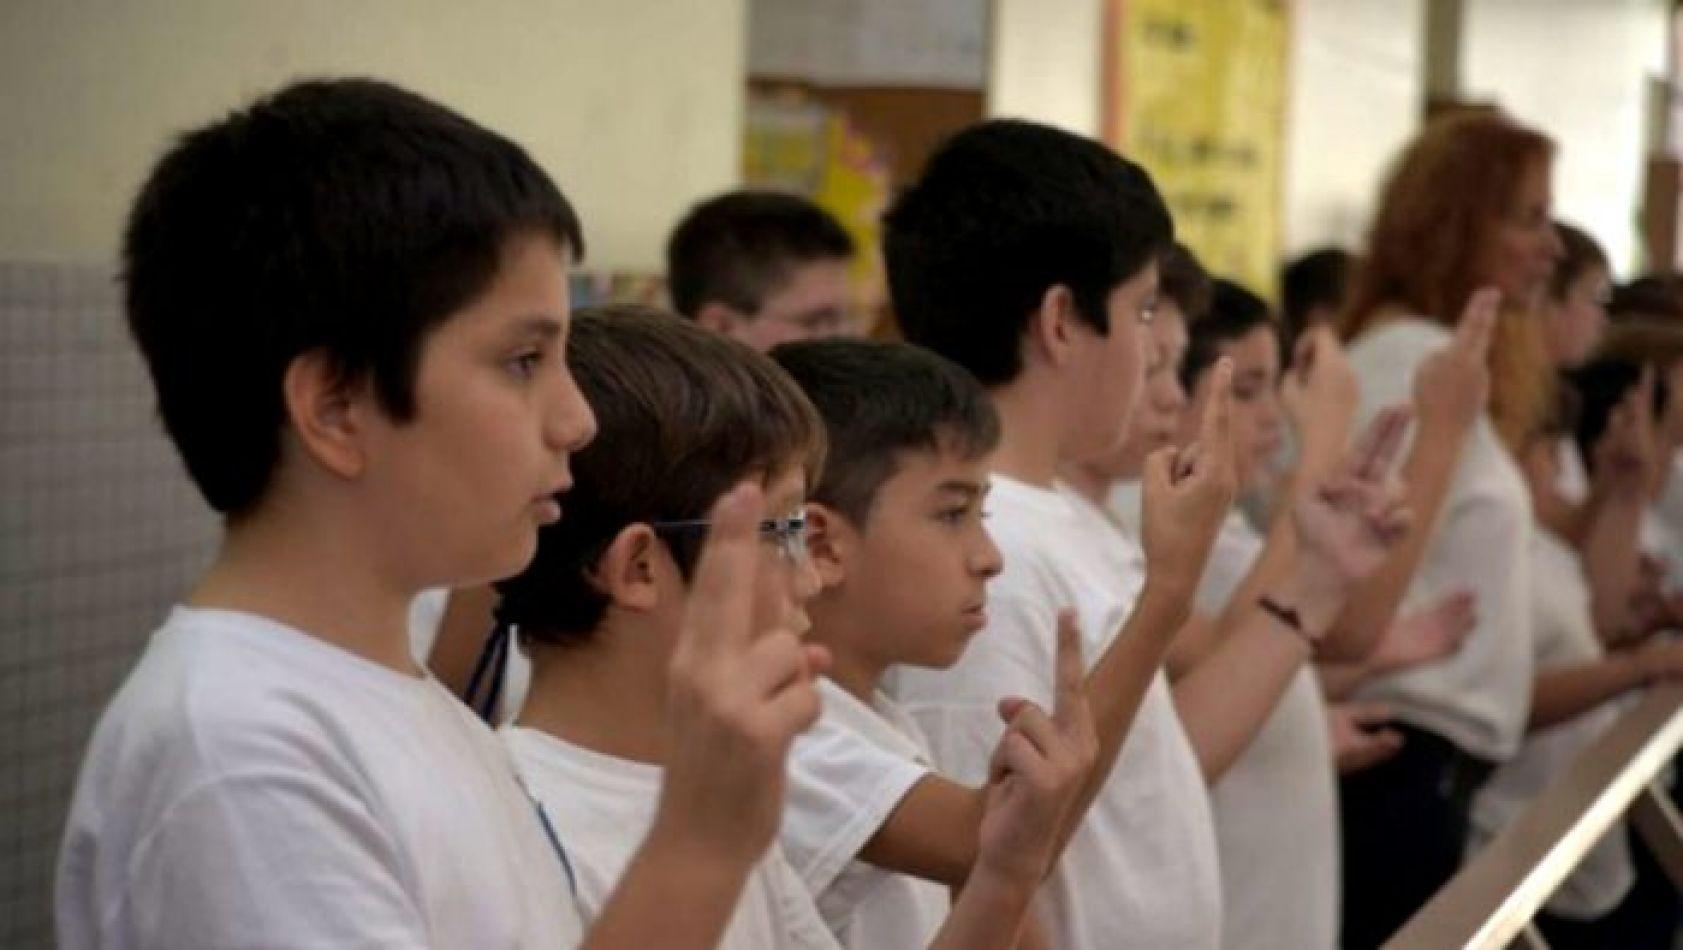 Argentina hará de la lengua de señas una materia obligatoria